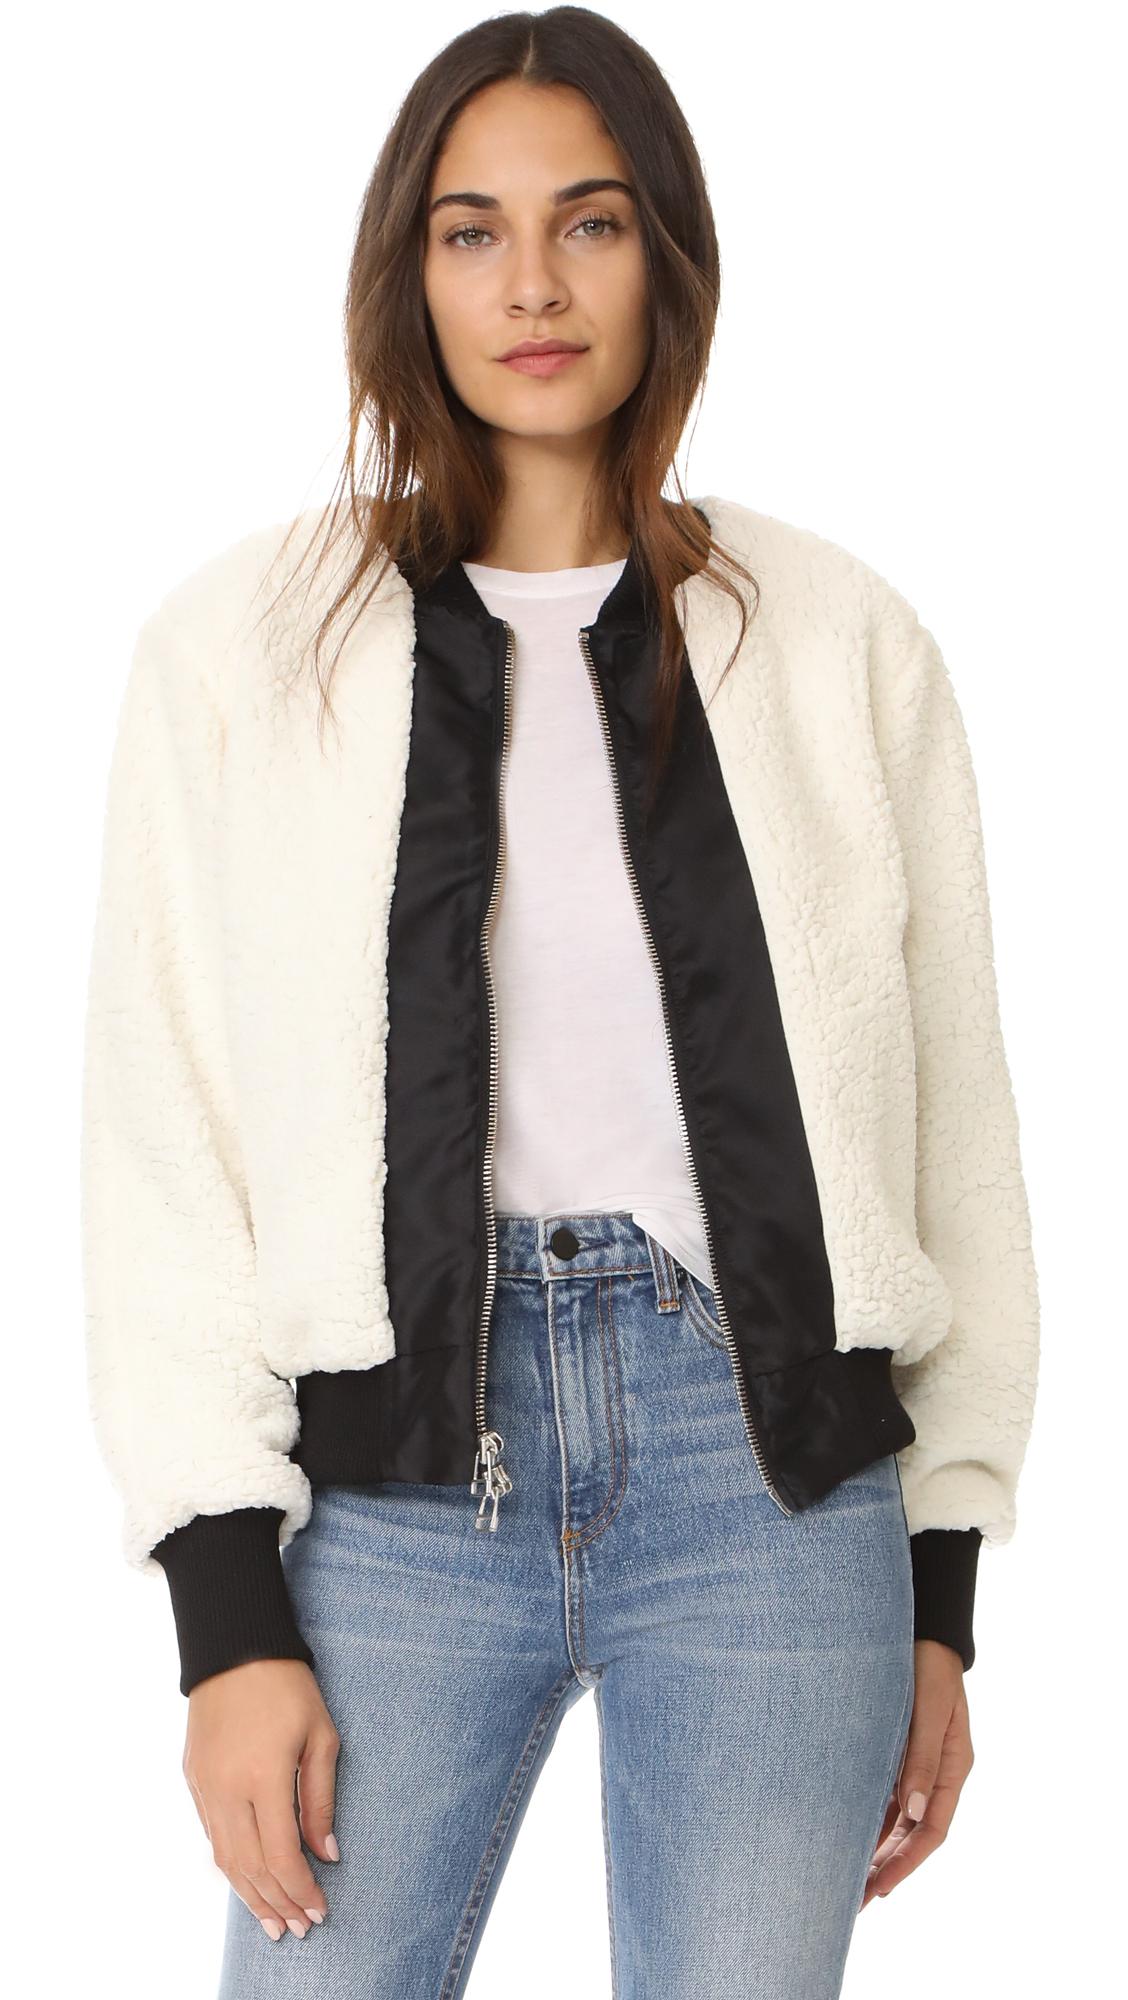 Daniel Patrick Heroine Bomber Sherpa Jacket - Ivory/Black